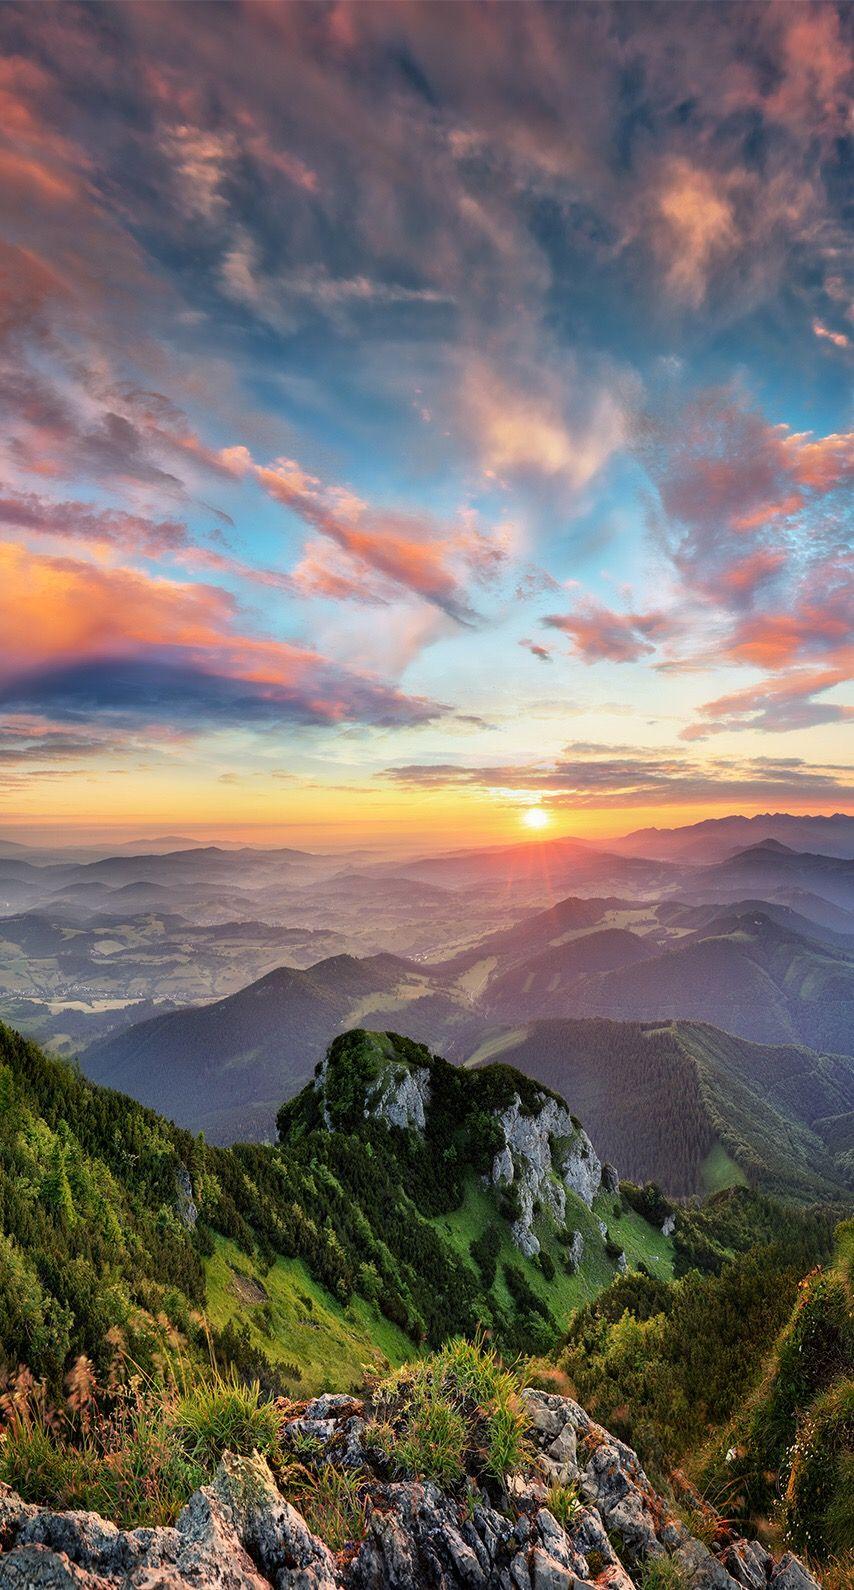 Hd Mountain Wallpaper Iphone Wallpaper Landscape Landscape Photography Nature Iphone Wallpaper Mountains